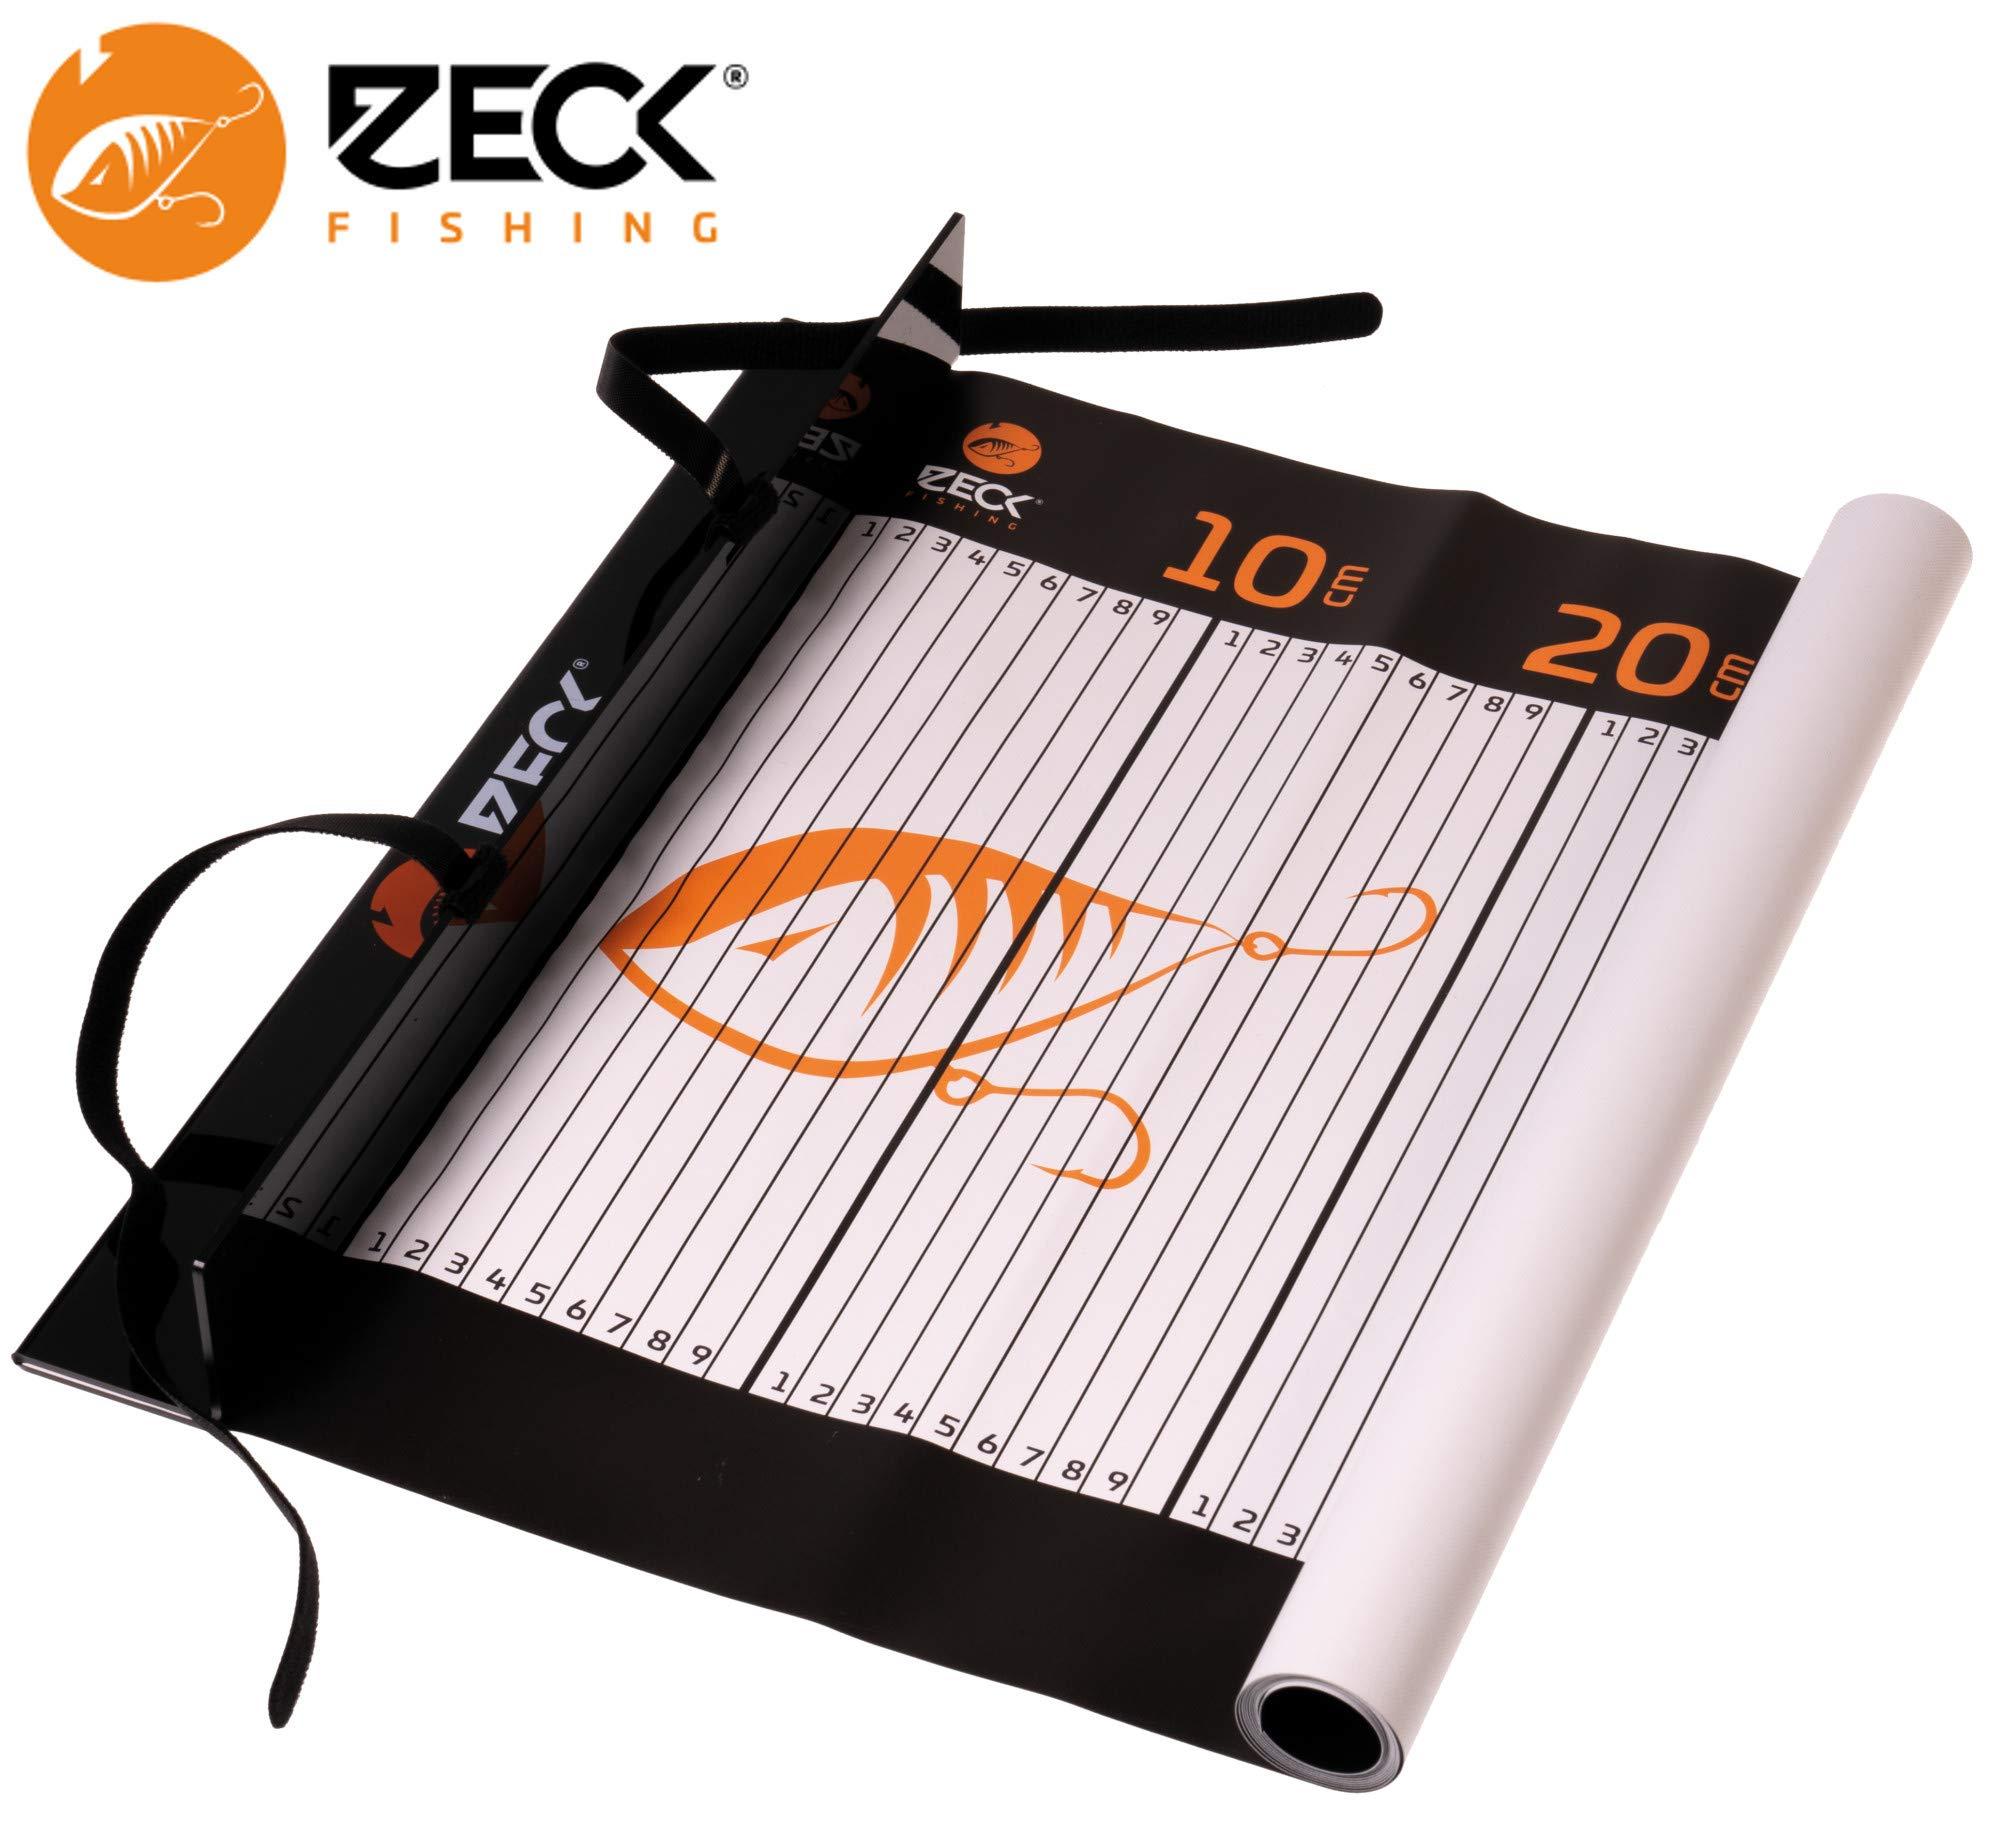 Zeck Unhooking Ruler 140 x 40 cm – Esterilla con Cinta métrica ...